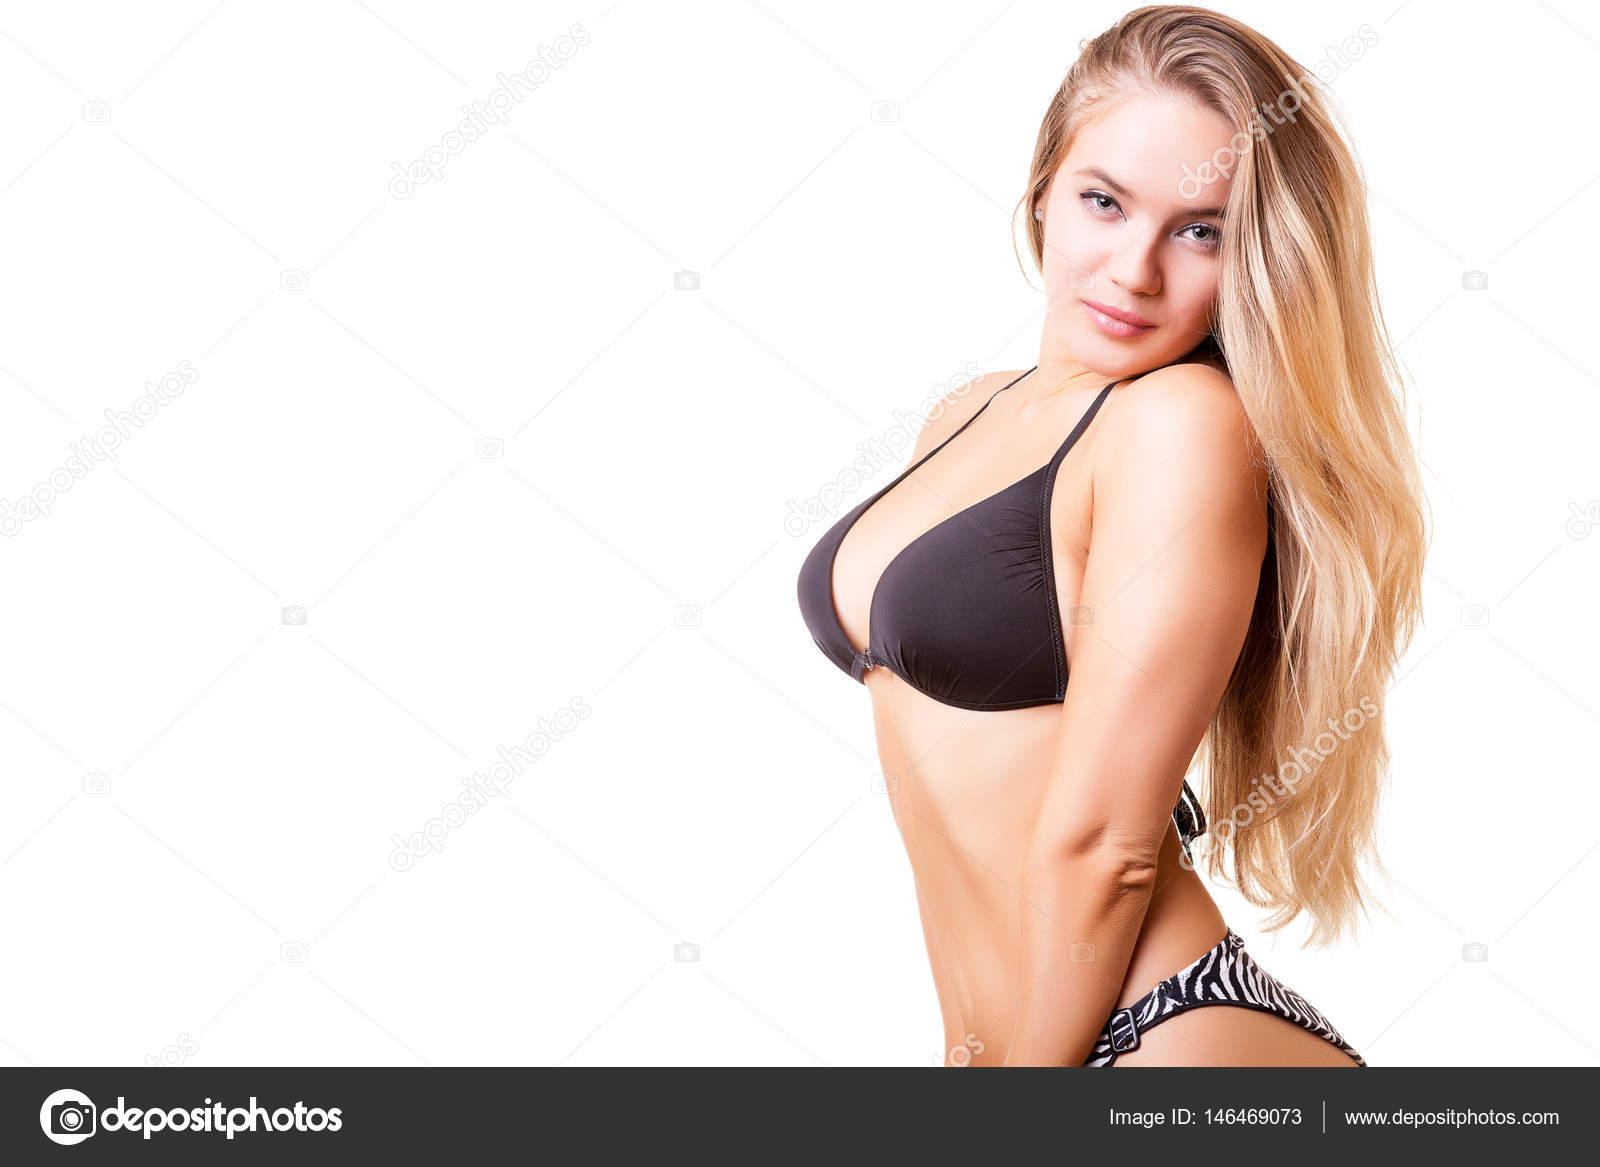 Rubia caliente hot blonde 2 de 2 - 3 5